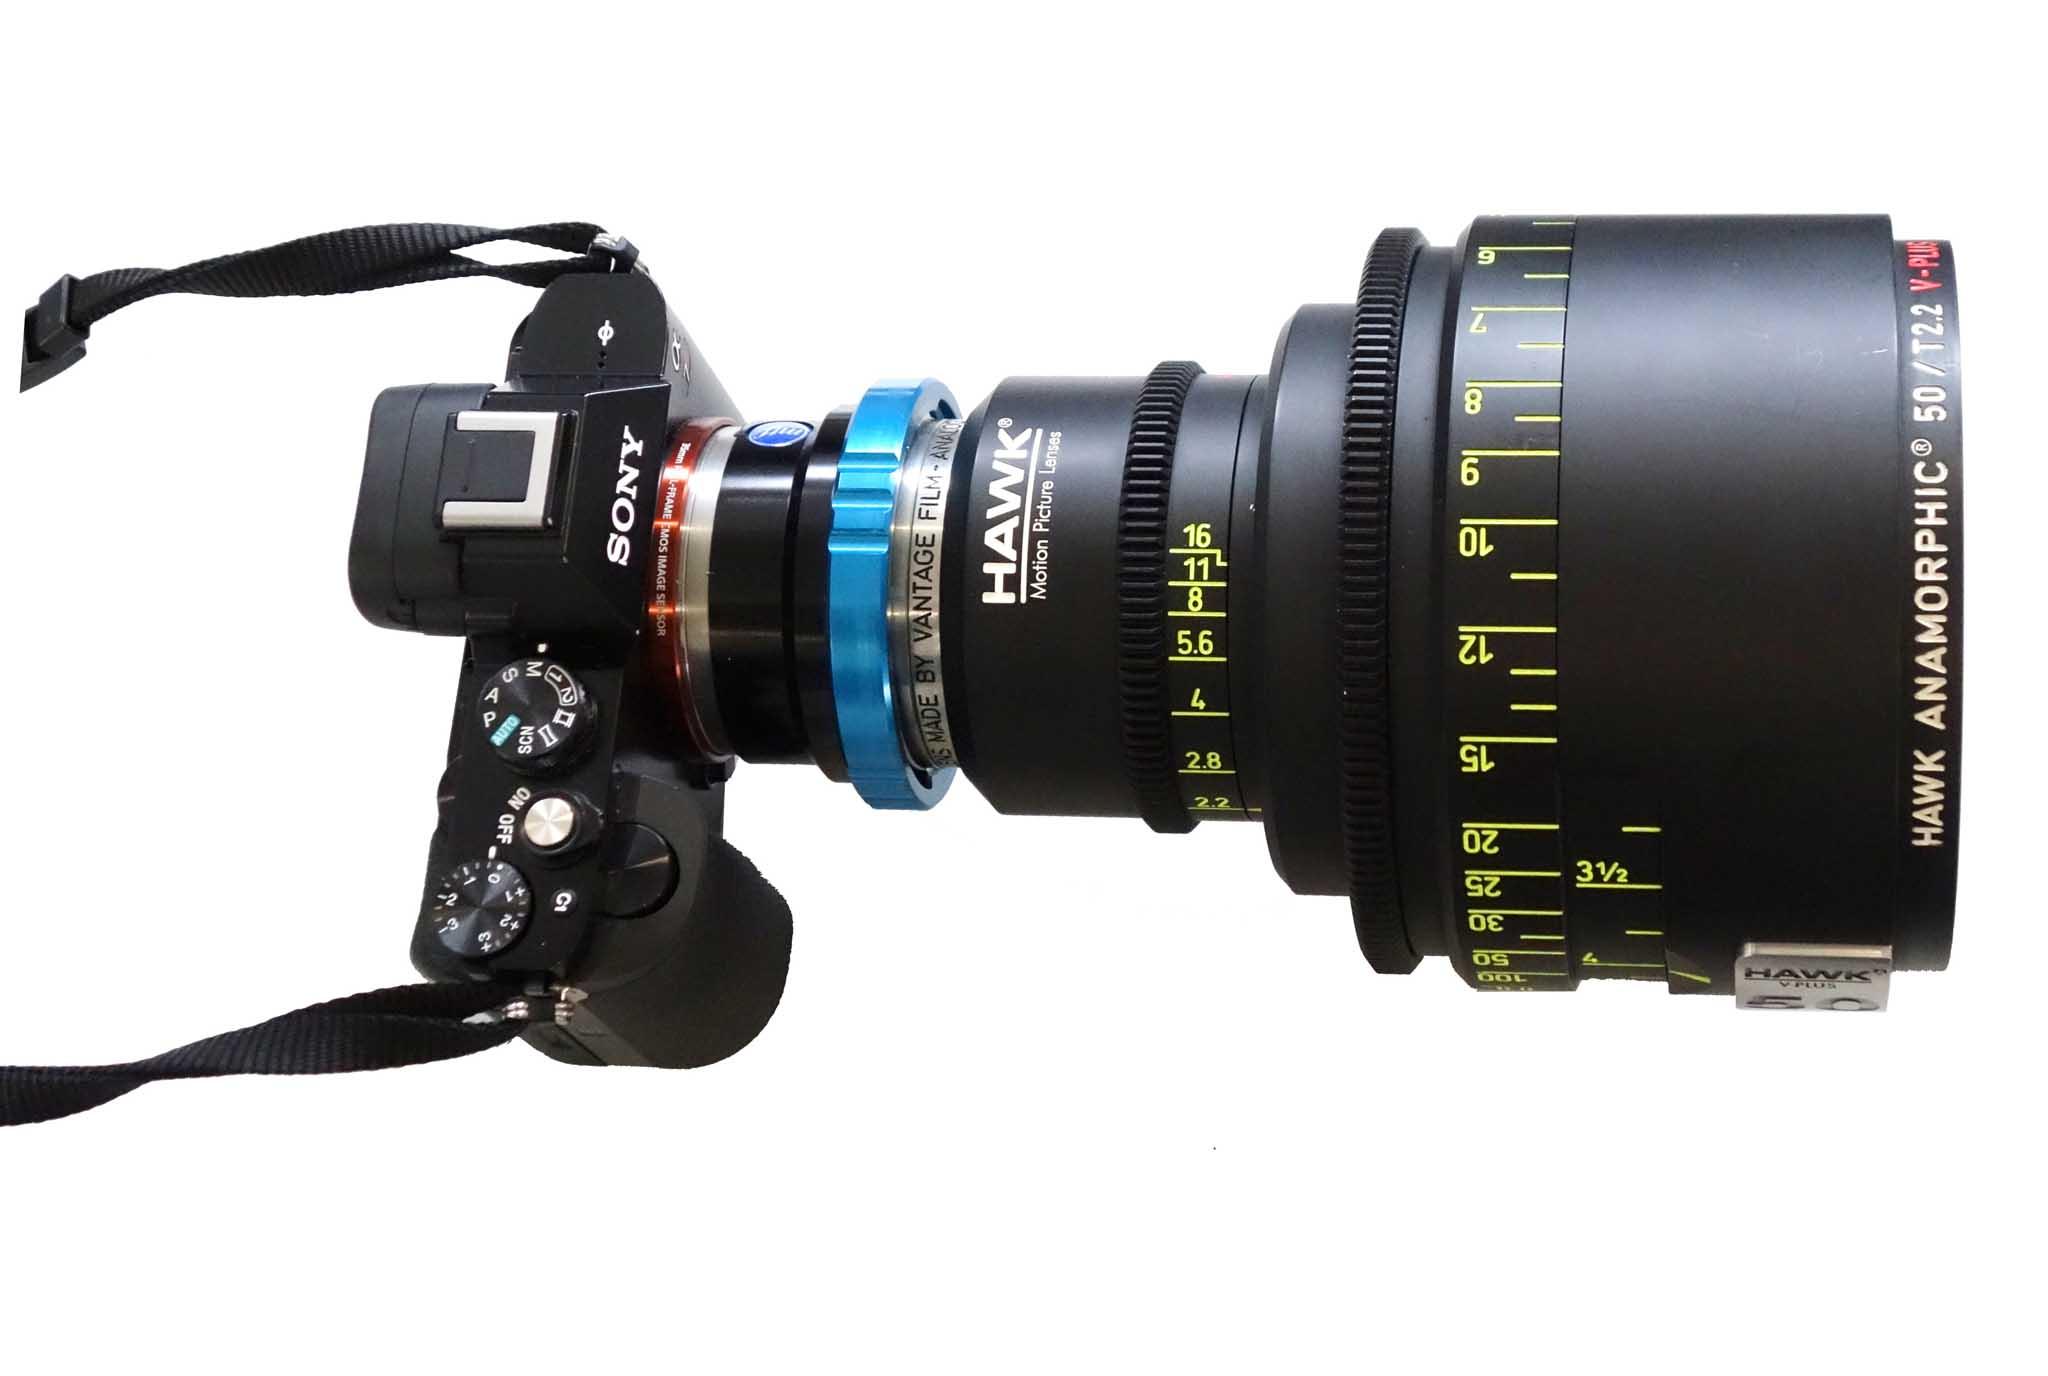 Sony Full Frame 24x36mm Cine Camera   Film and Digital Times